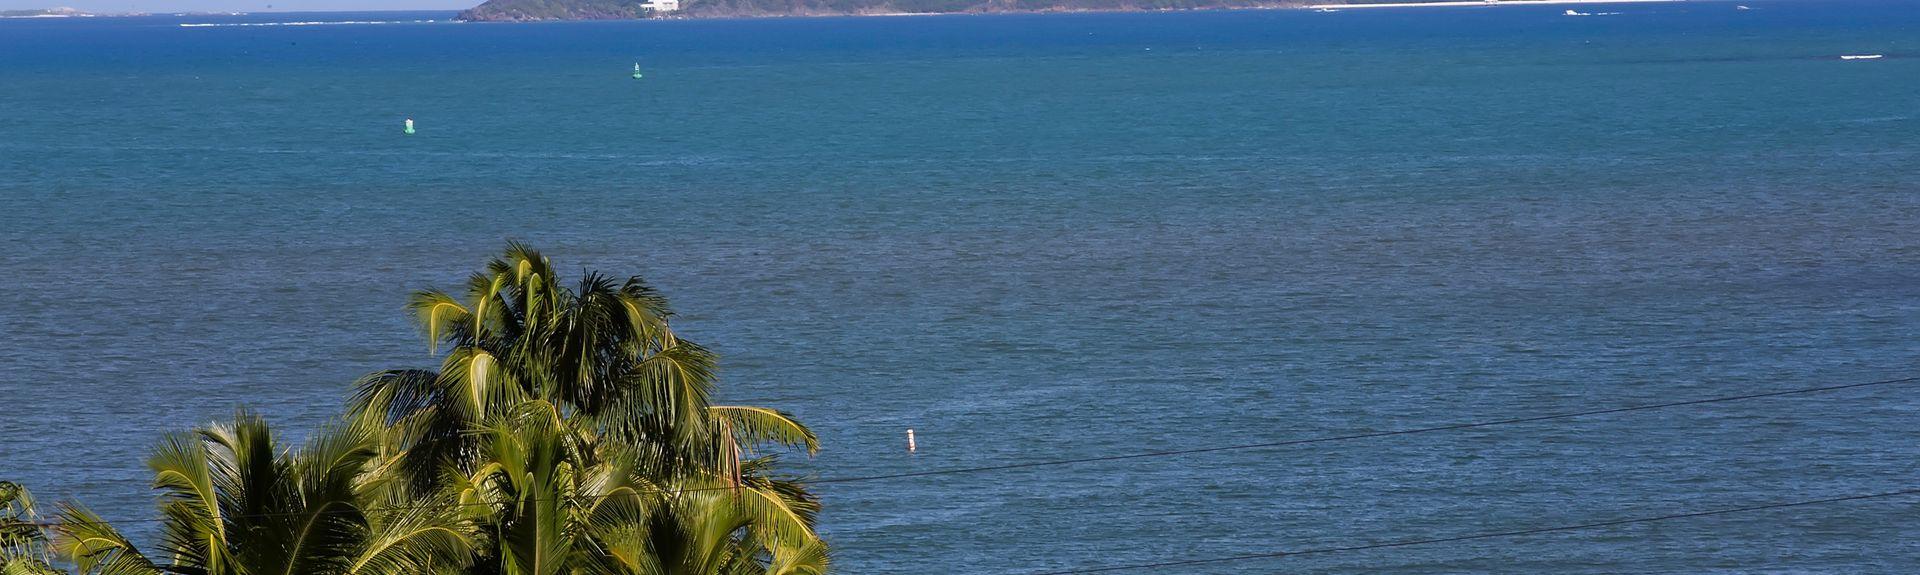 Las Croabas, Cabezas, Fajardo, Portoryko